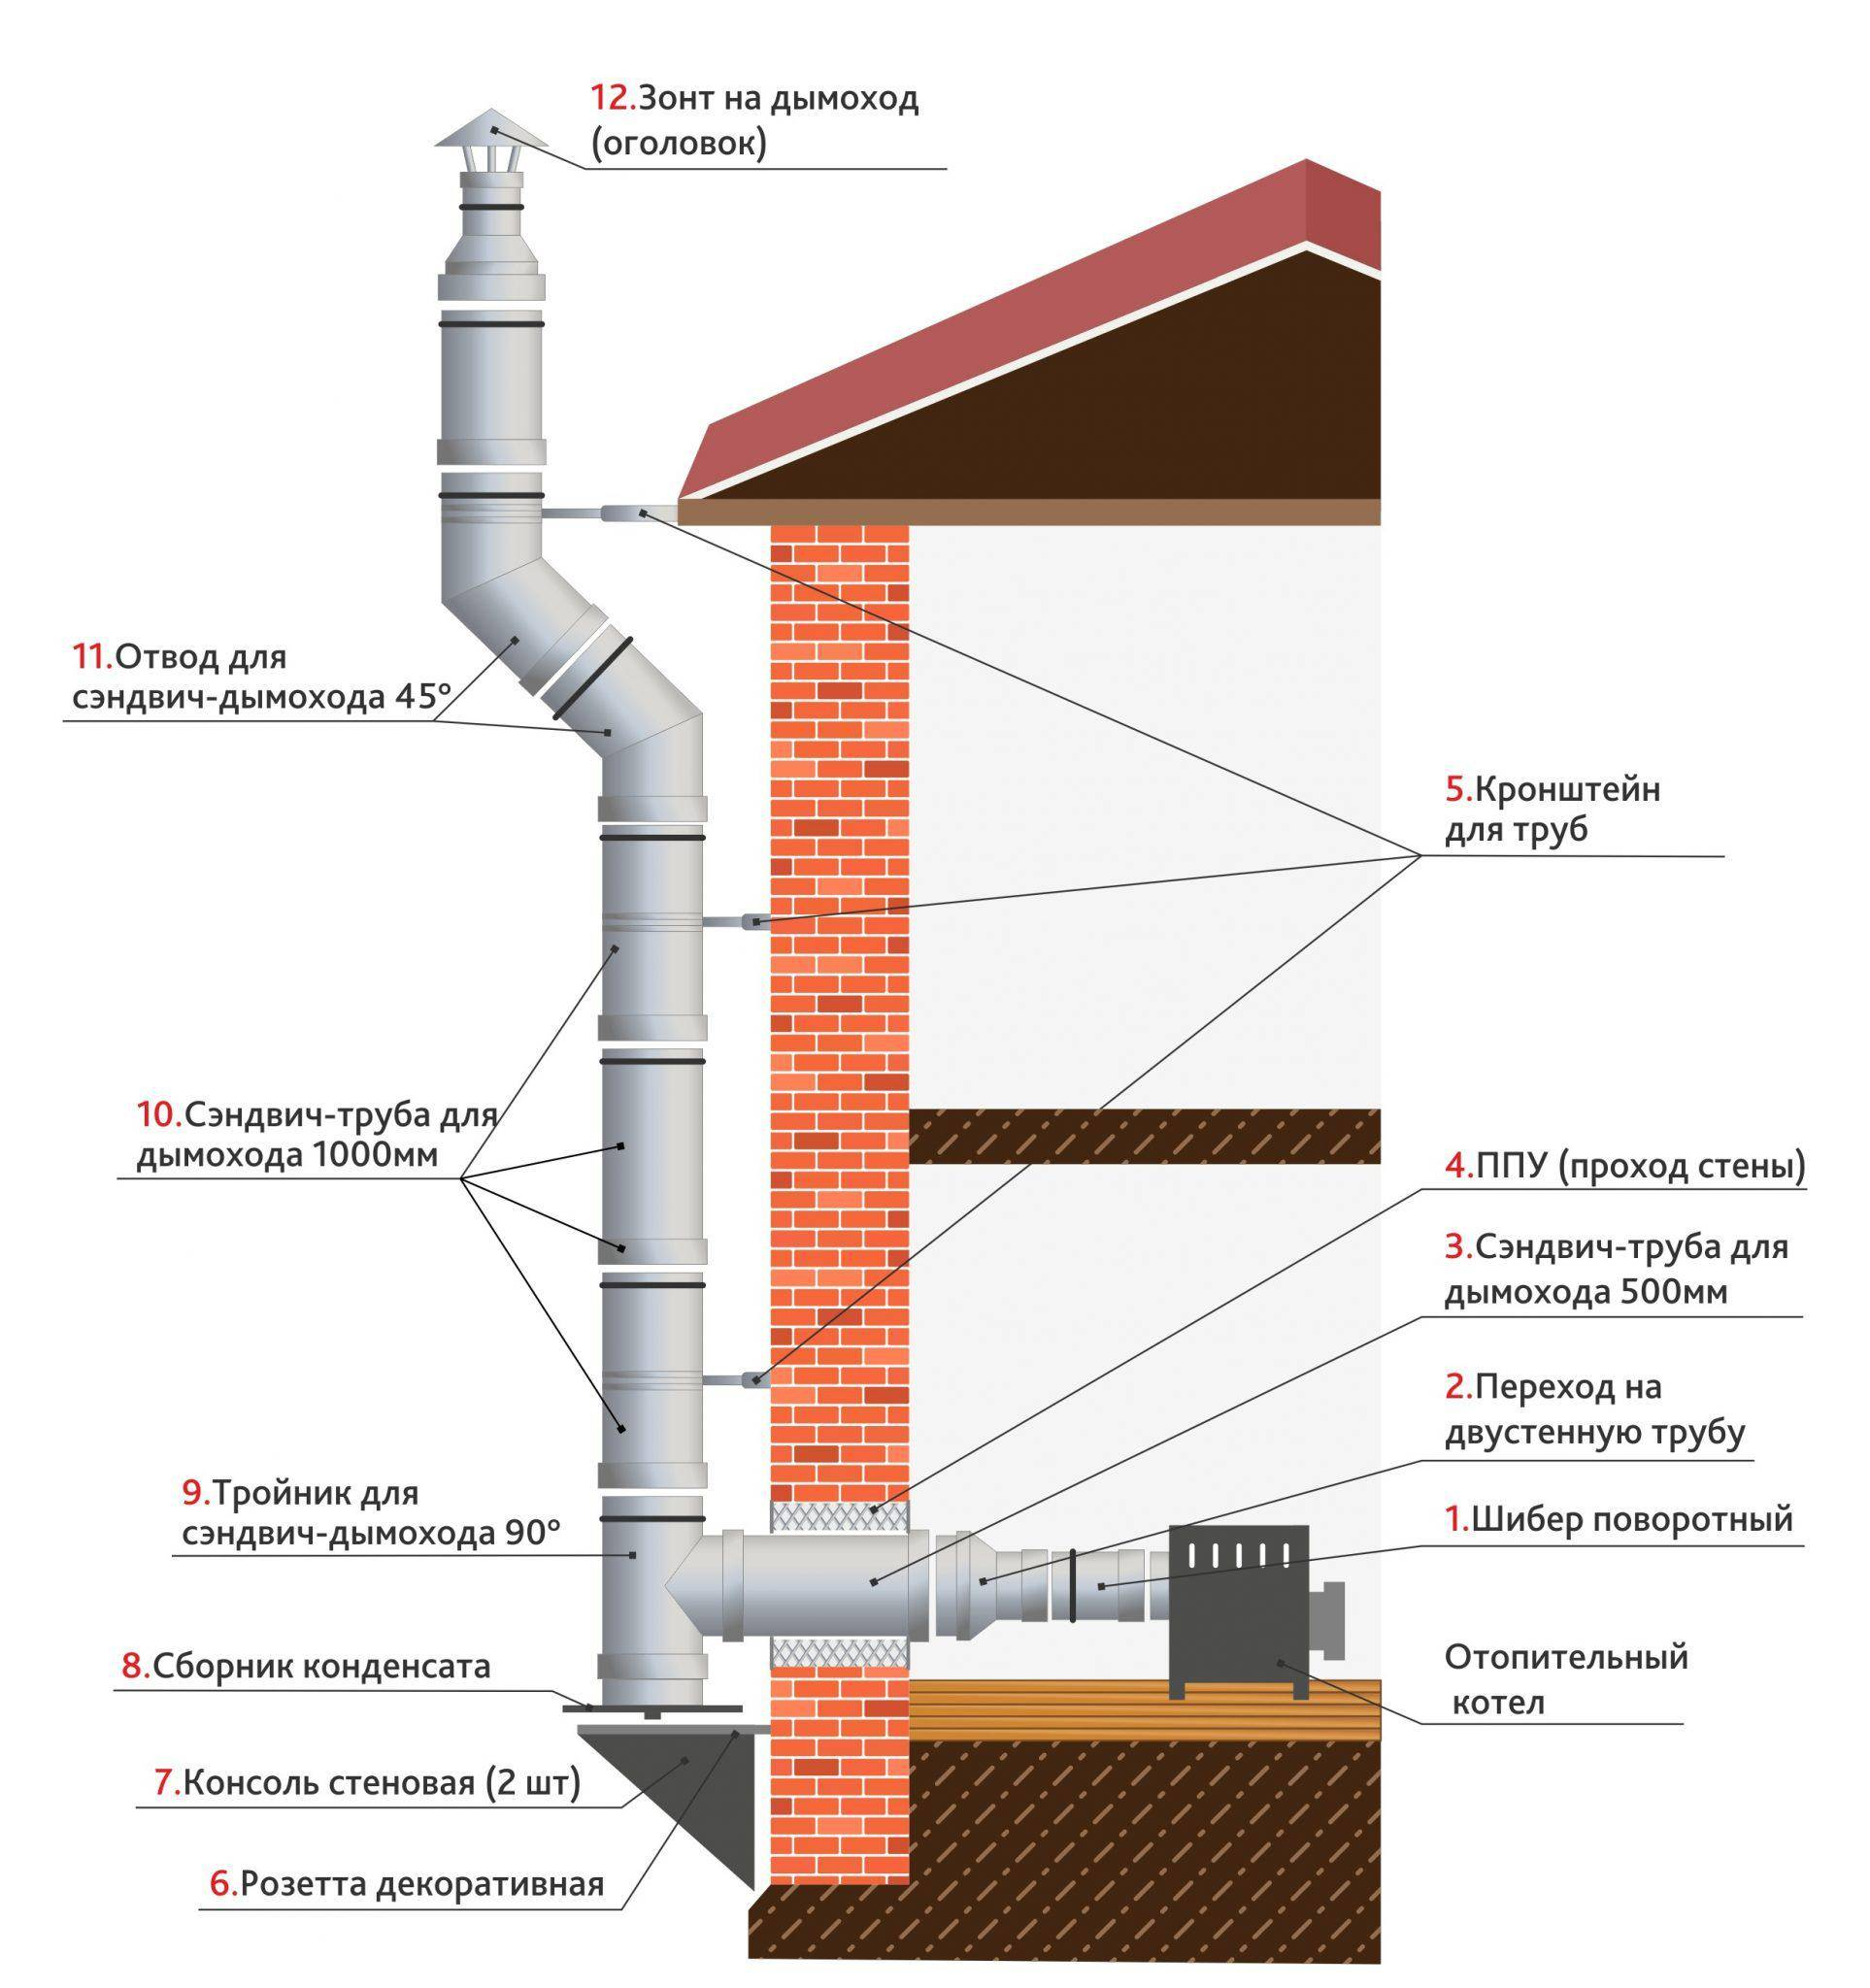 Колпак на трубу дымохода своими руками:характеристики, разновидности, изготовление и монтаж